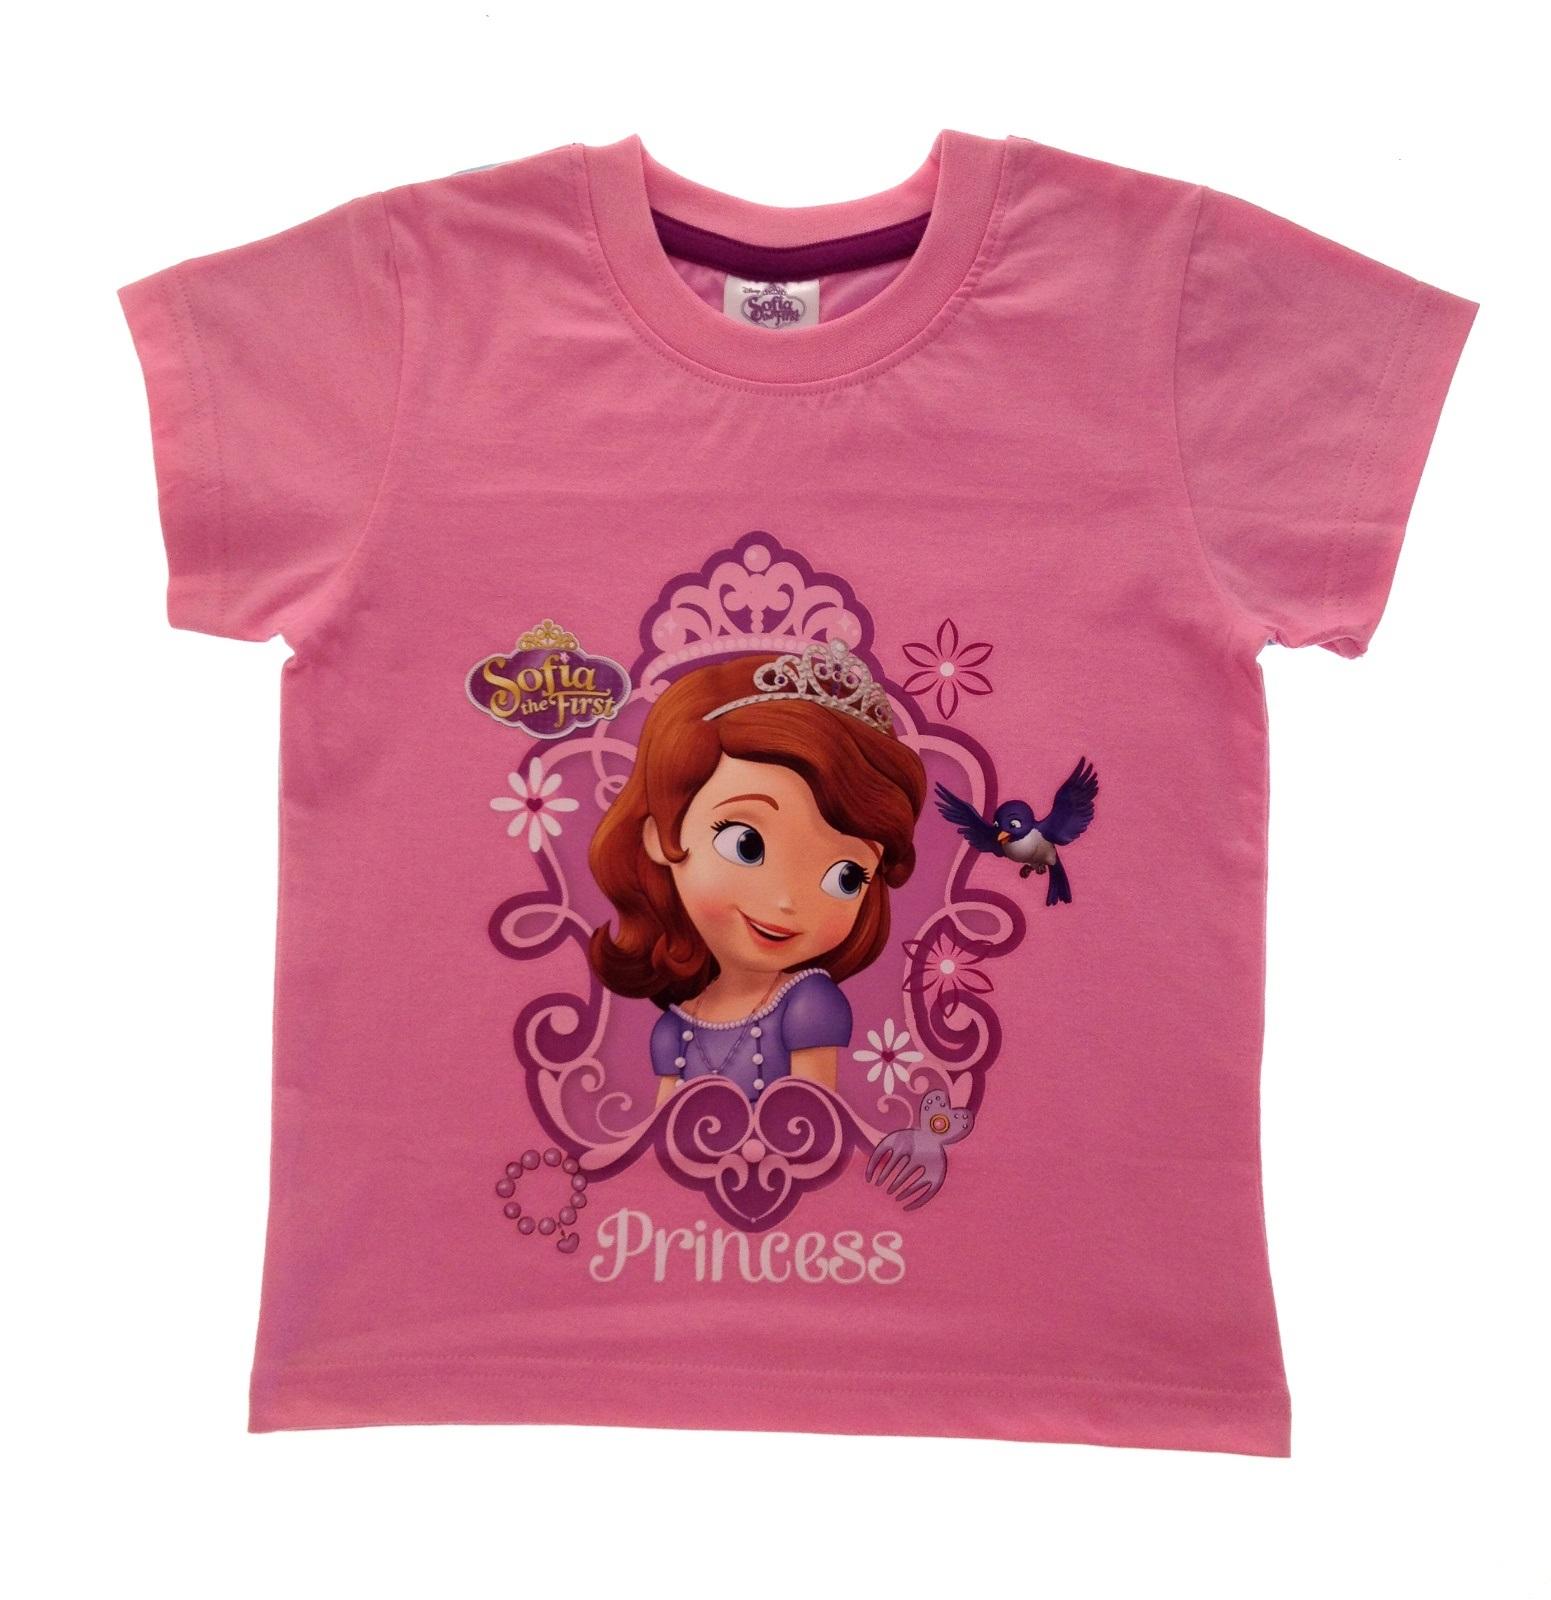 Disney princess sofia t shirt short sleeved top girls for Best shirts for girls